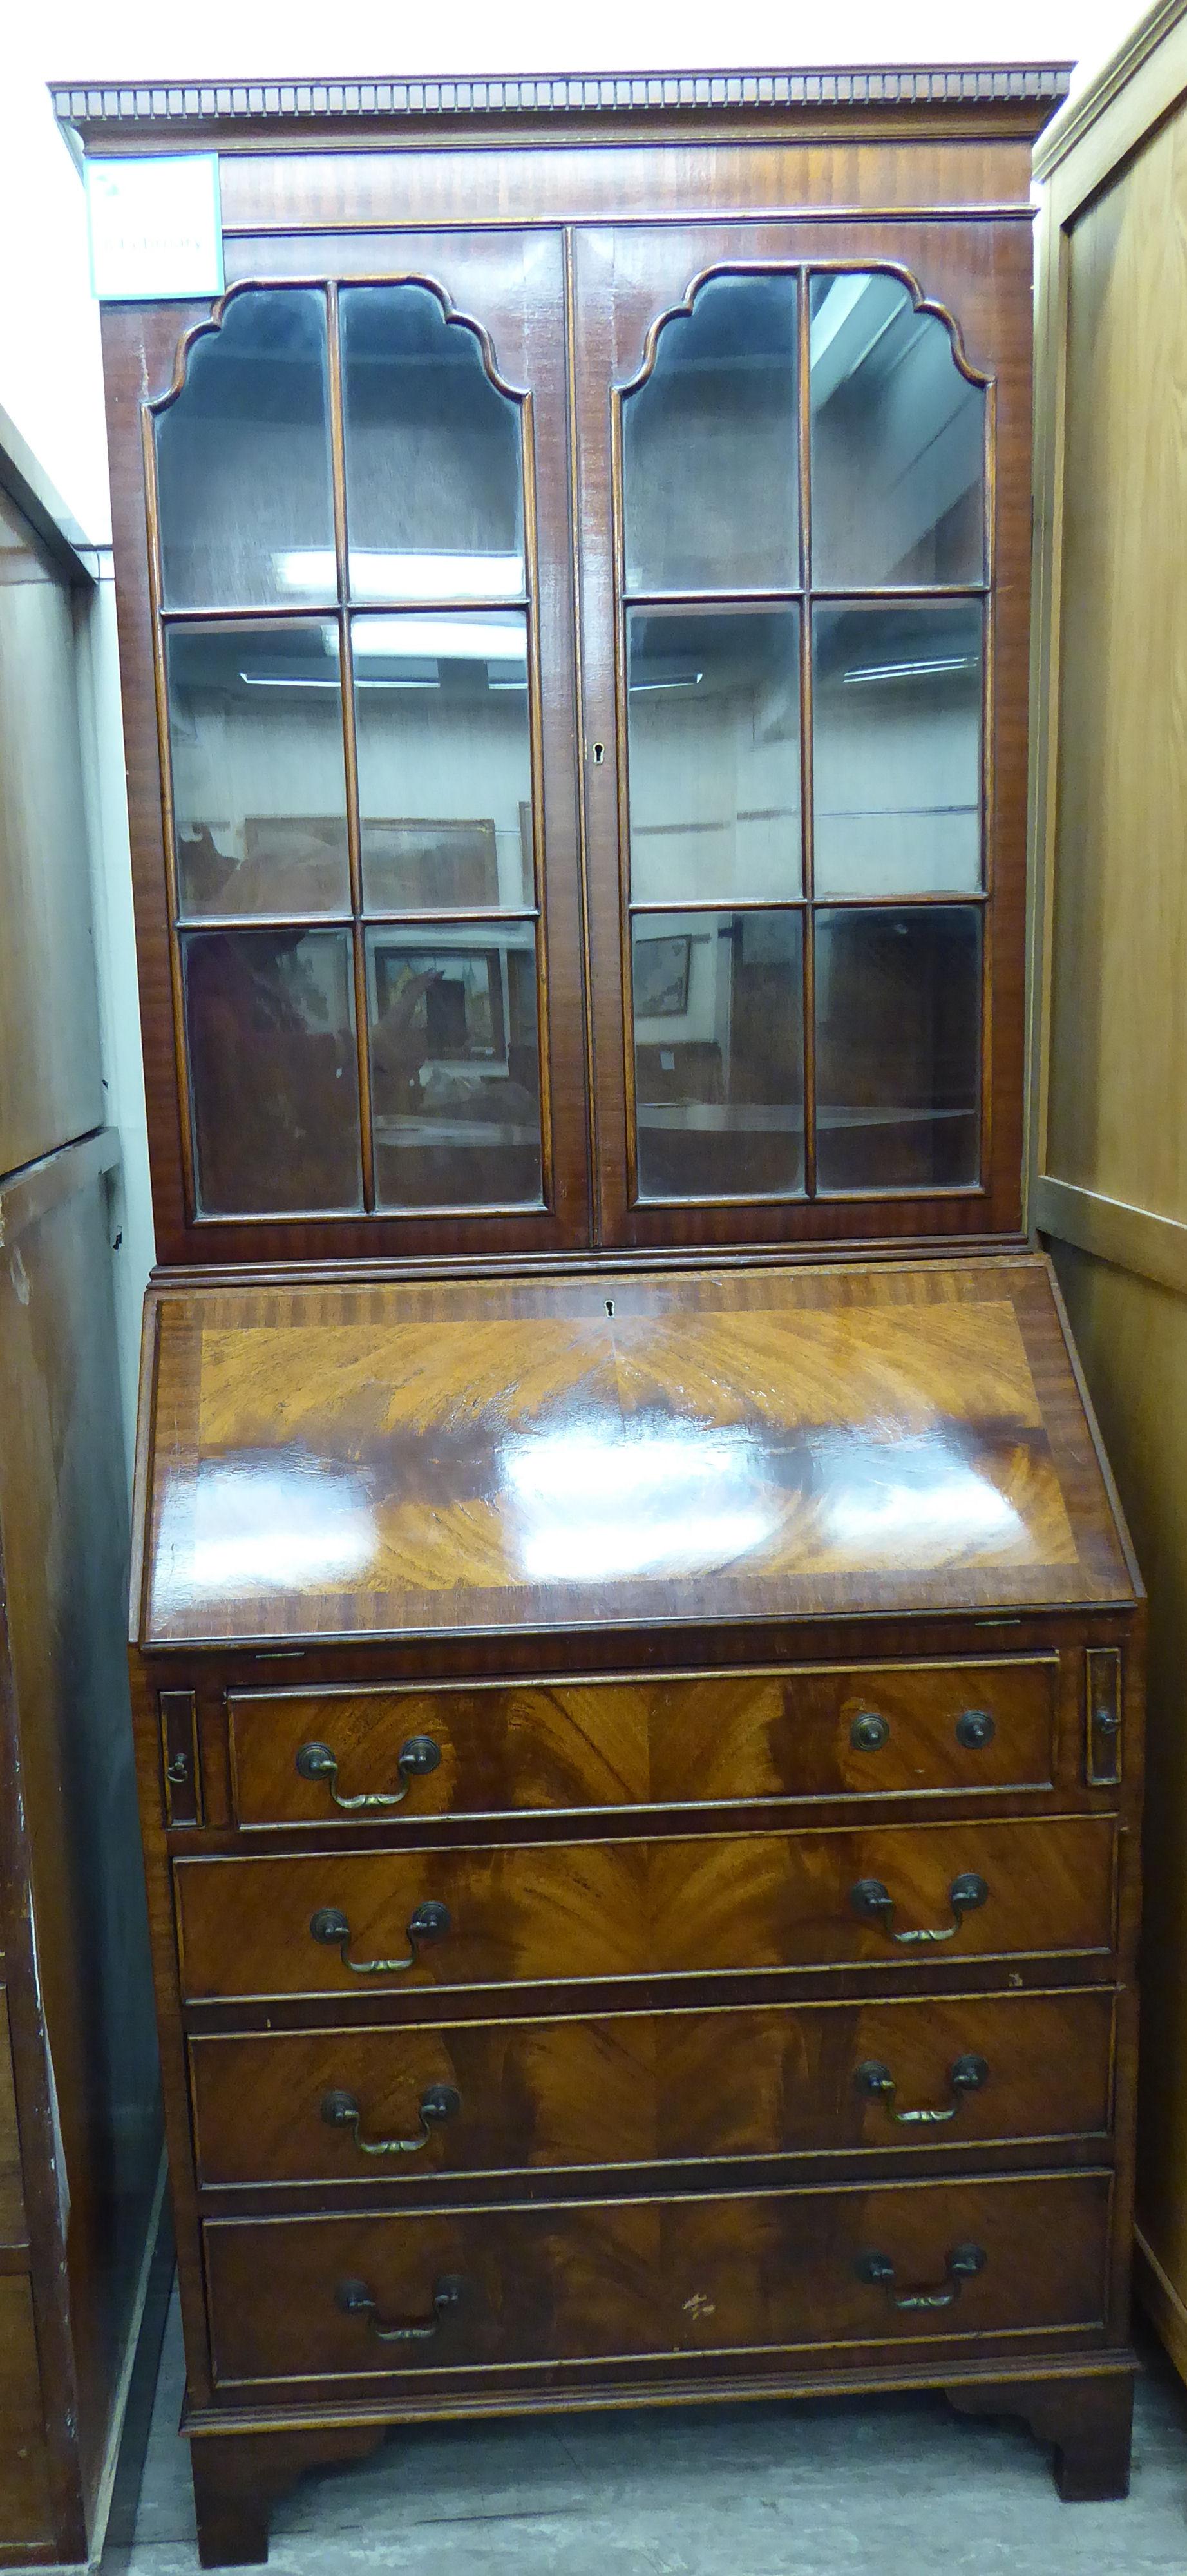 Lot 40 - A modern Georgian style mahogany bureau bookcase with a dentil moulded cornice,